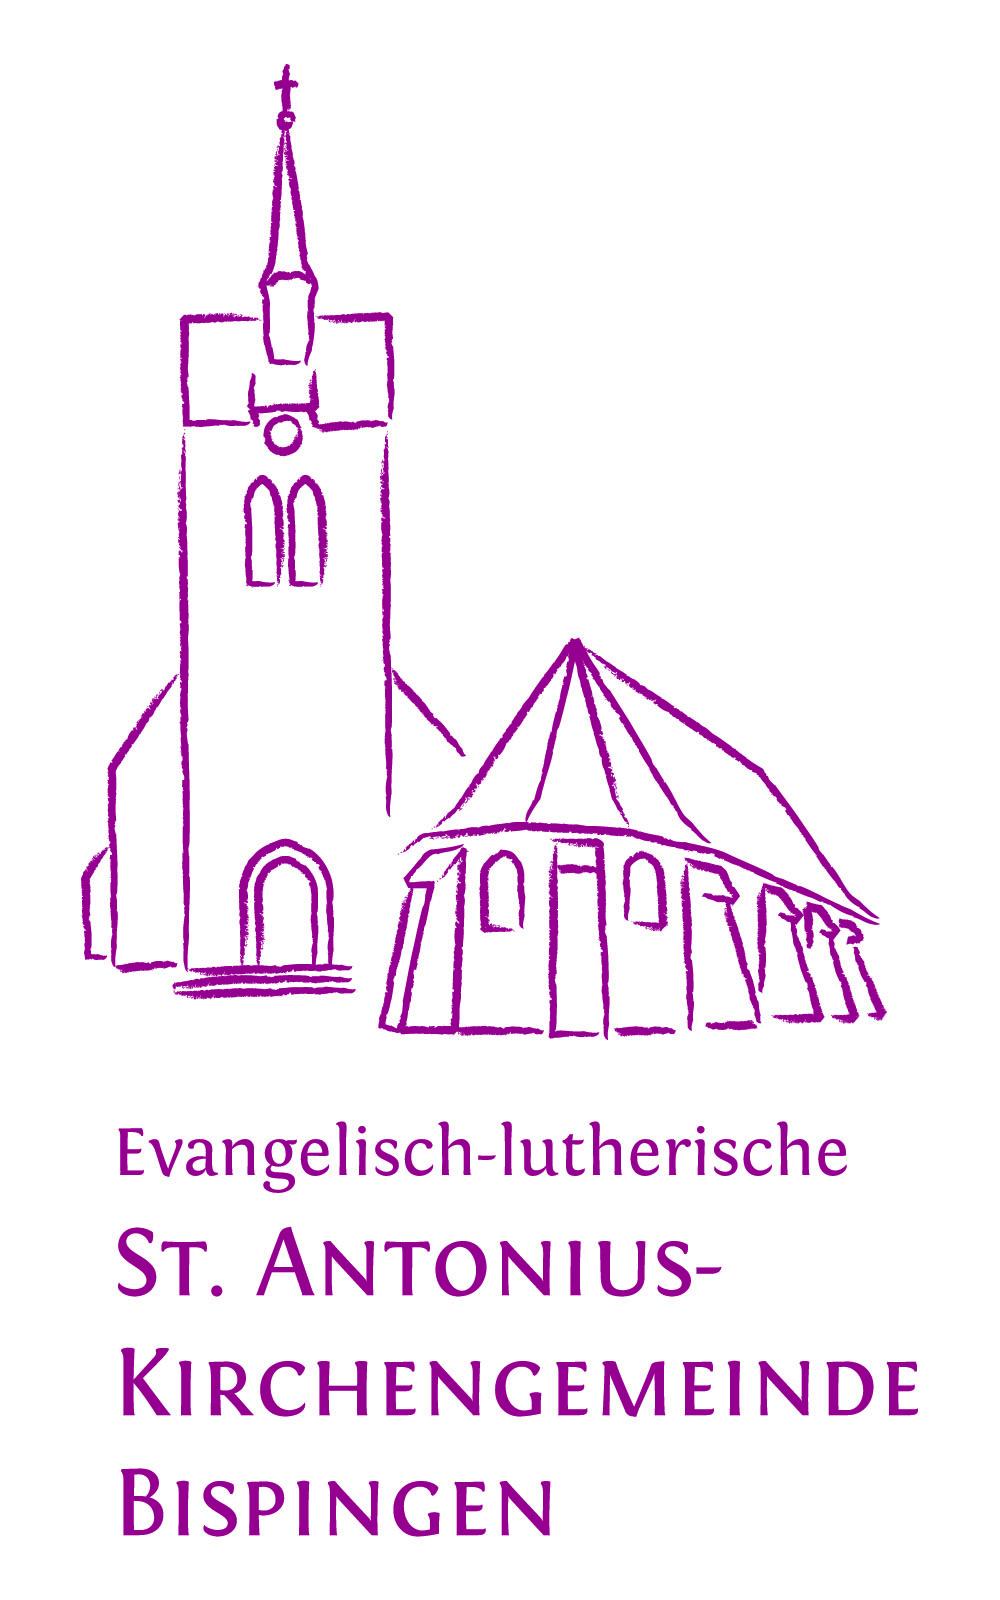 Logo_StAntonius_CMYK_Text.jpg